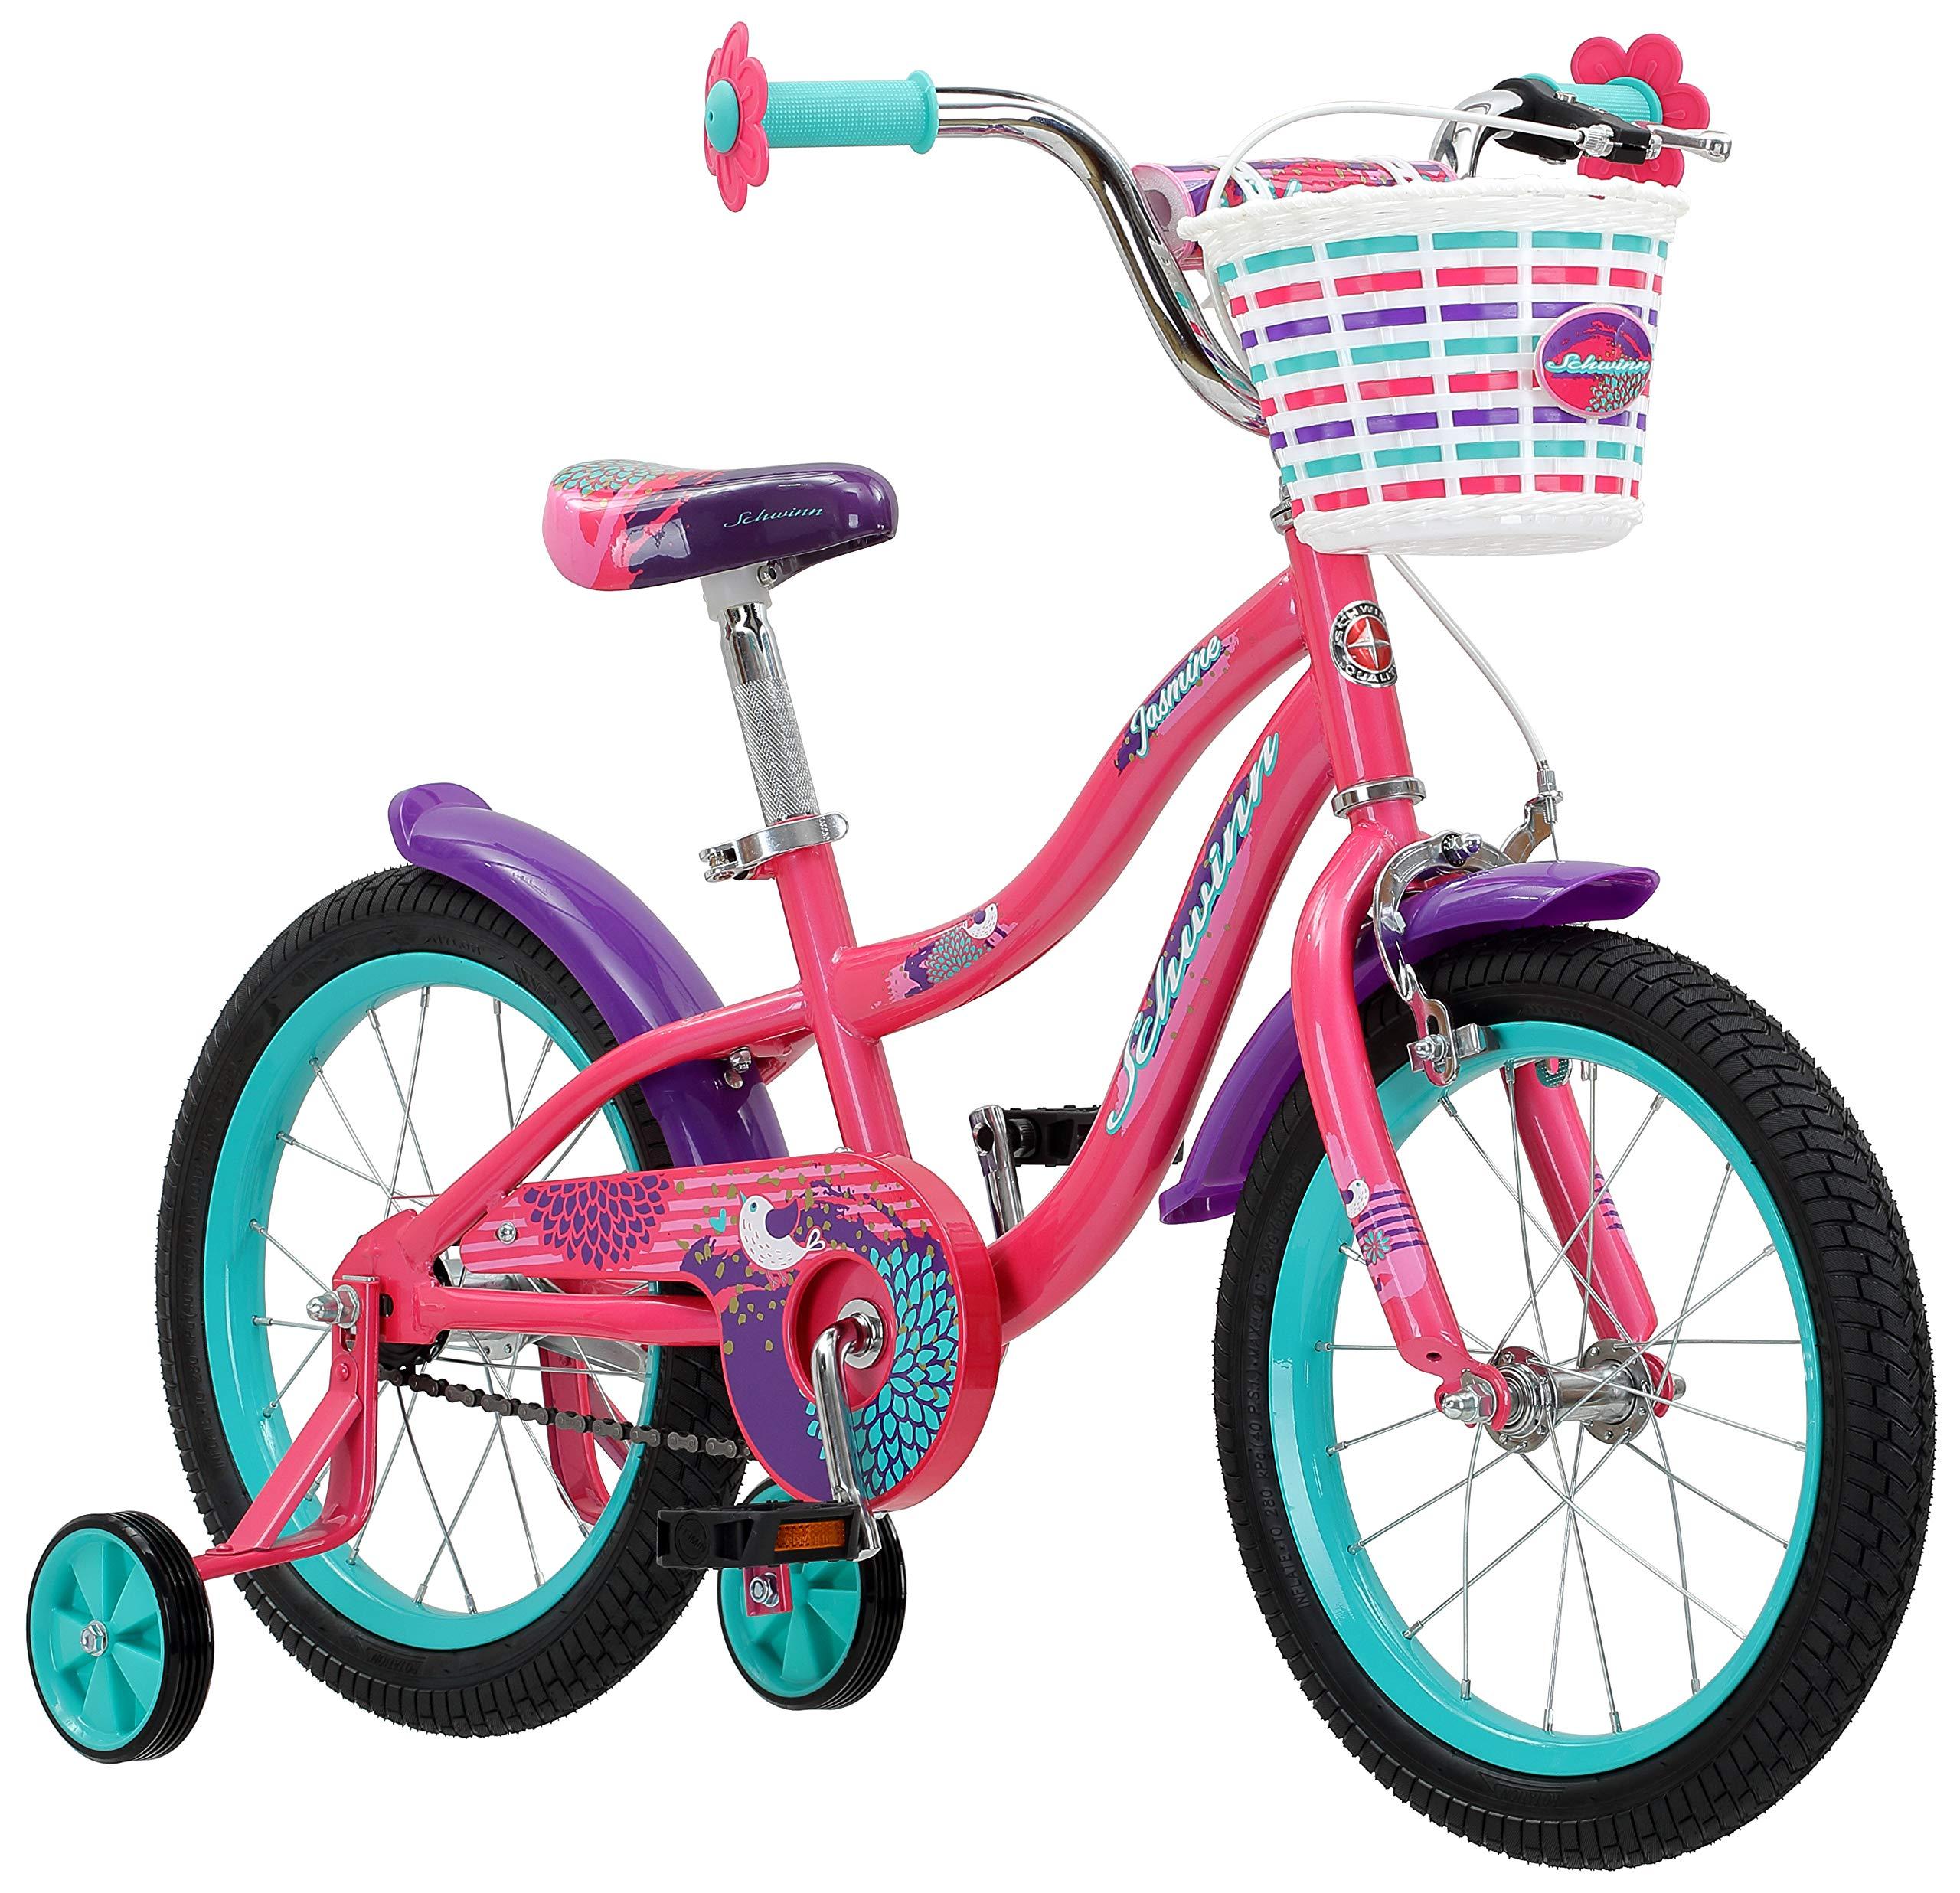 Schwinn Jasmine Girl's Bike with Training Wheels, 16'' Wheels, Pink by Schwinn